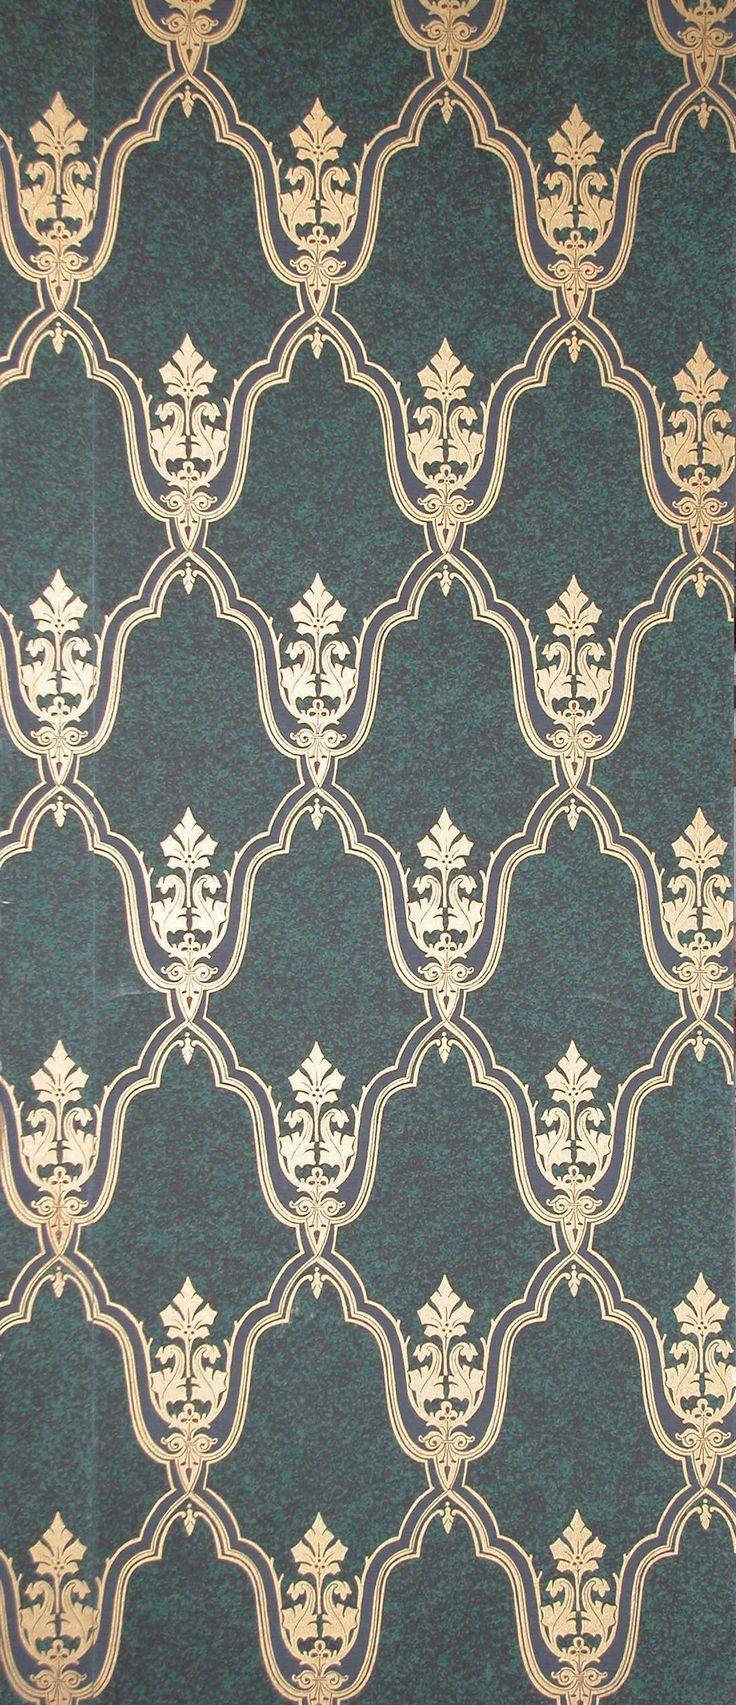 Wallpaper Melias                                                                                                                                                                                 More